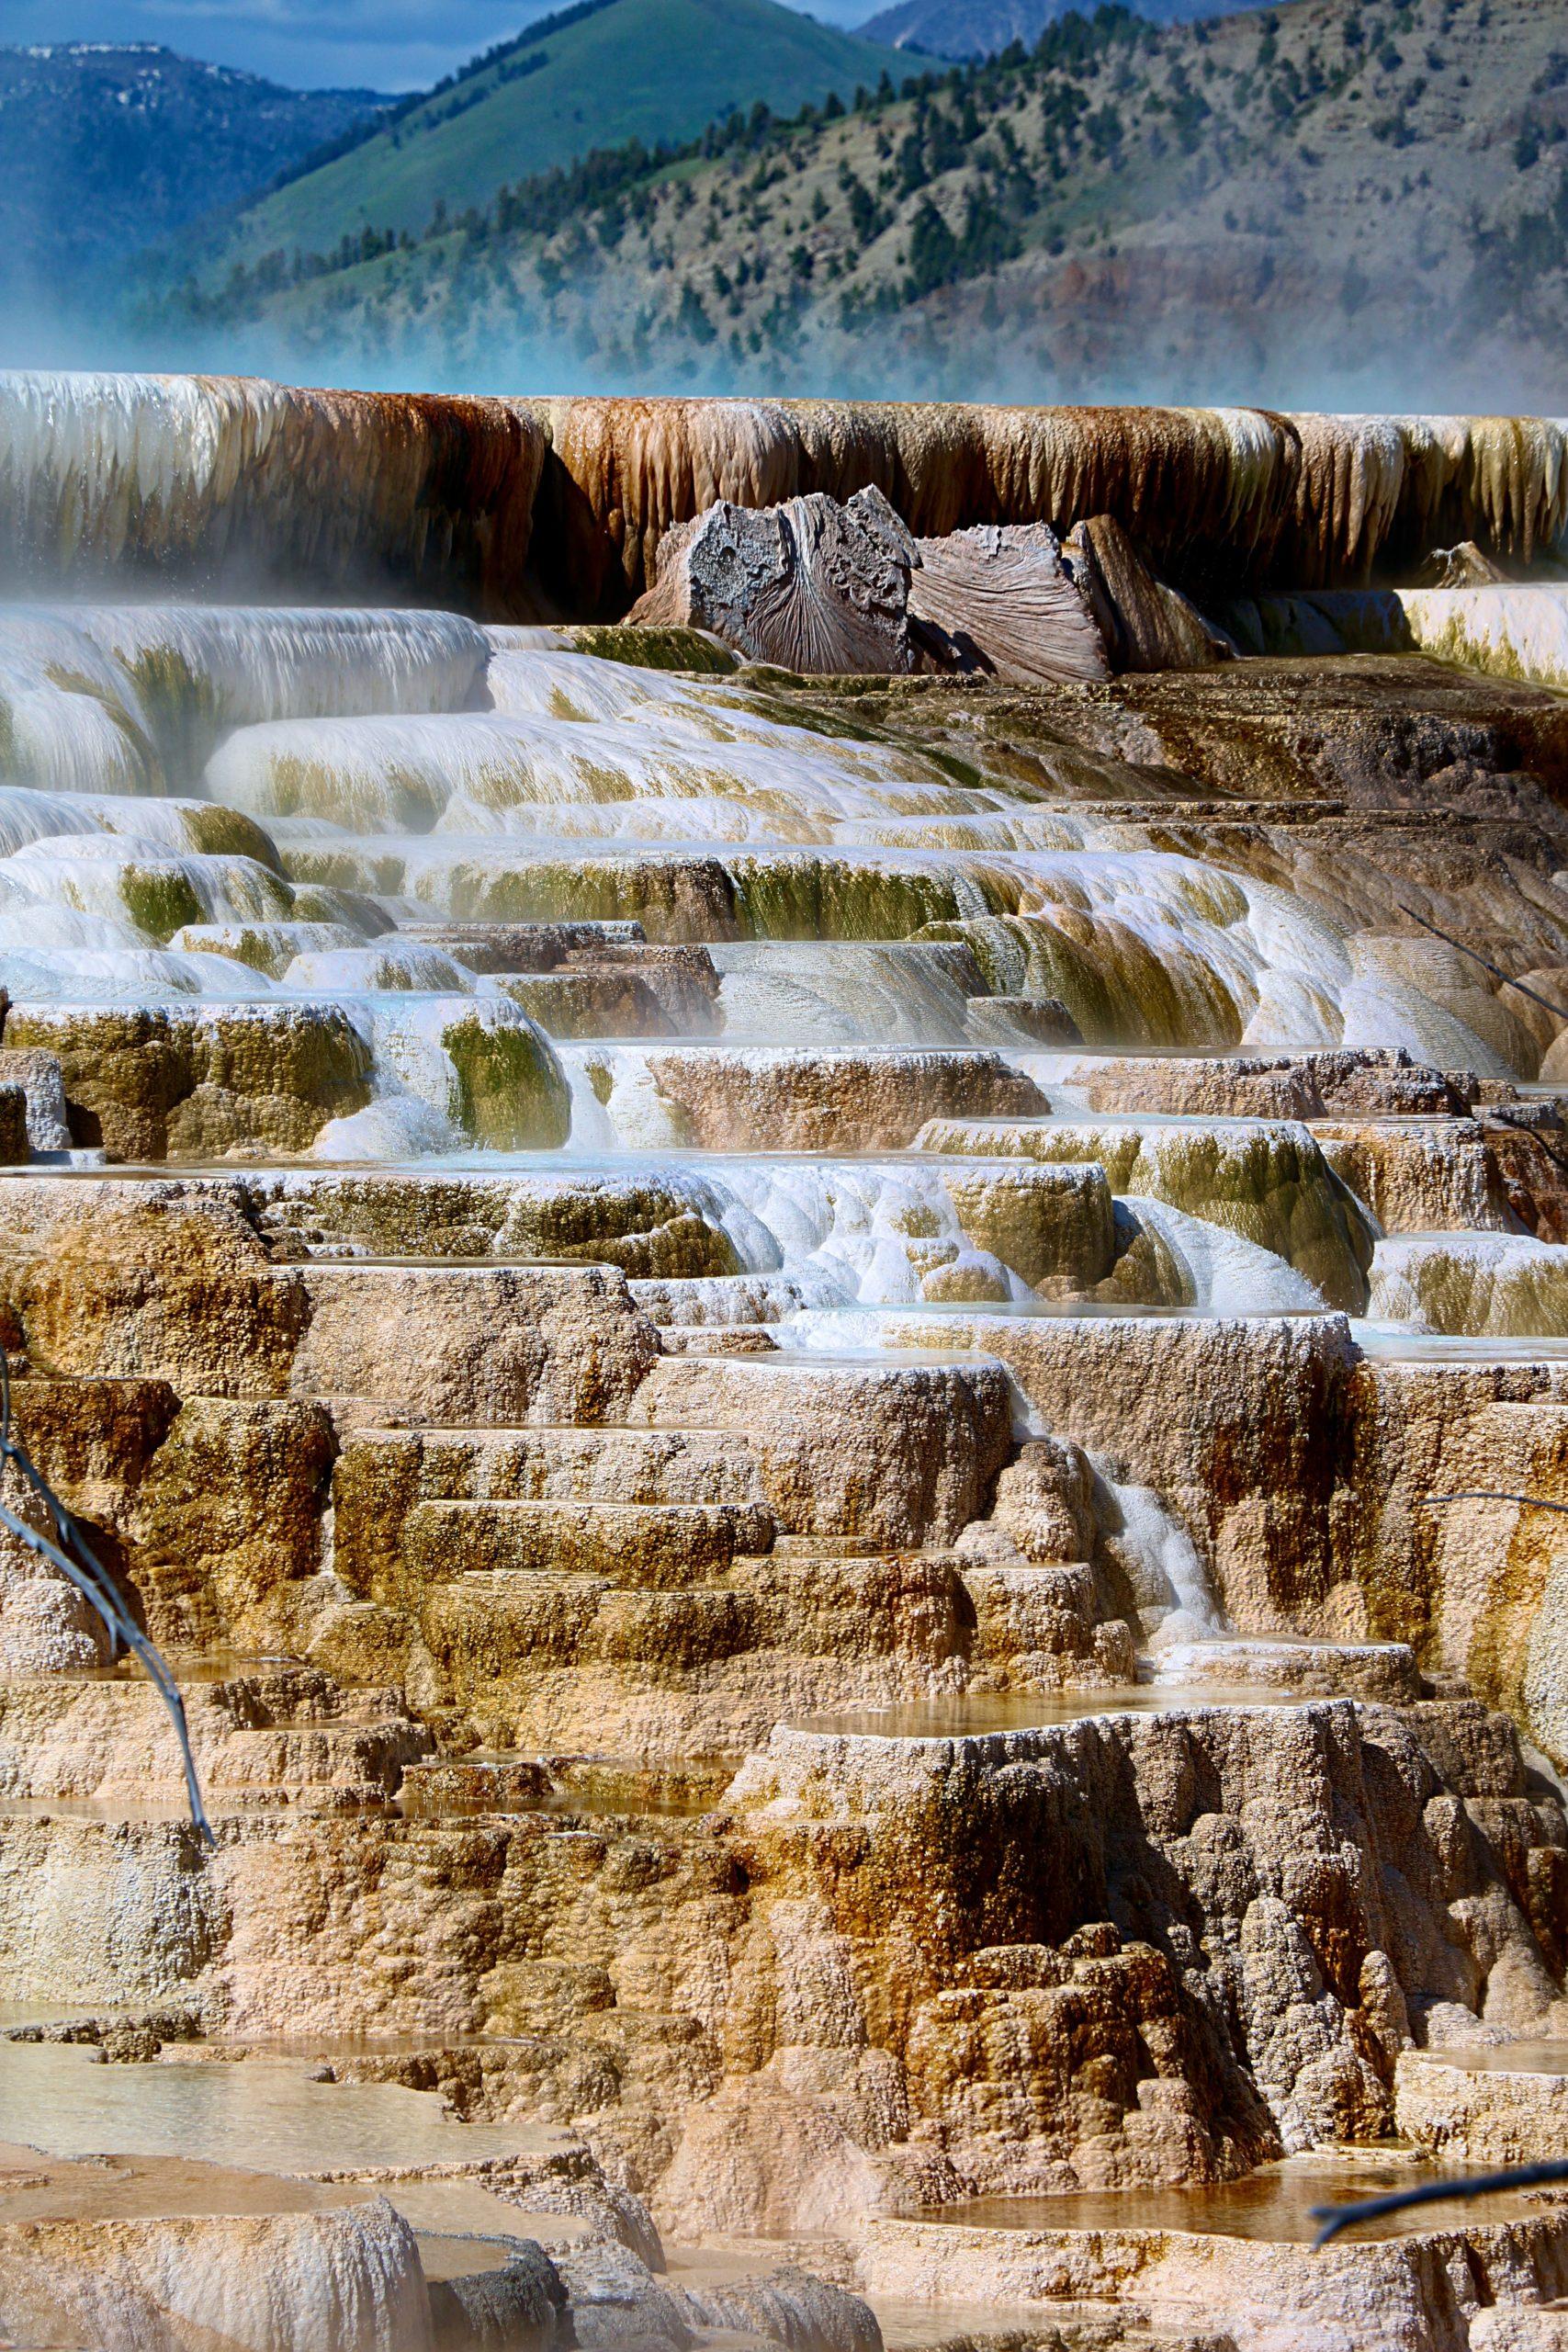 mammoth spring in yellowstone